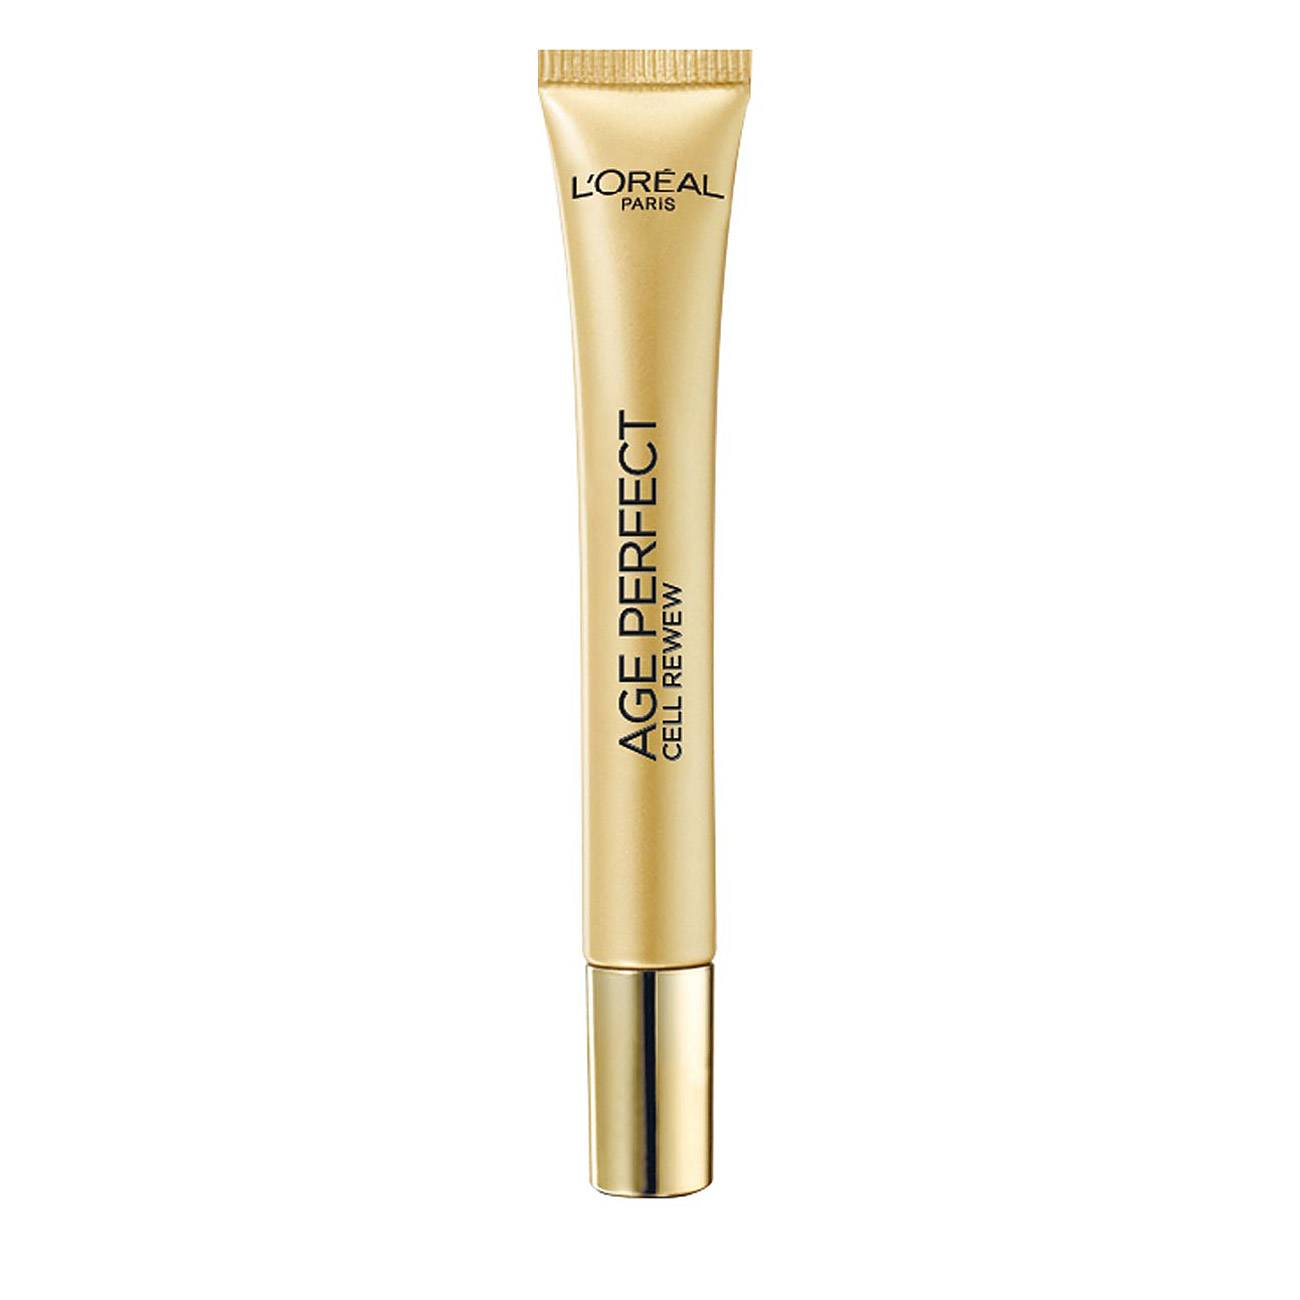 Age Perfect Cell Renew Eyes Cream 15ml L'Oreal imagine 2021 bestvalue.eu